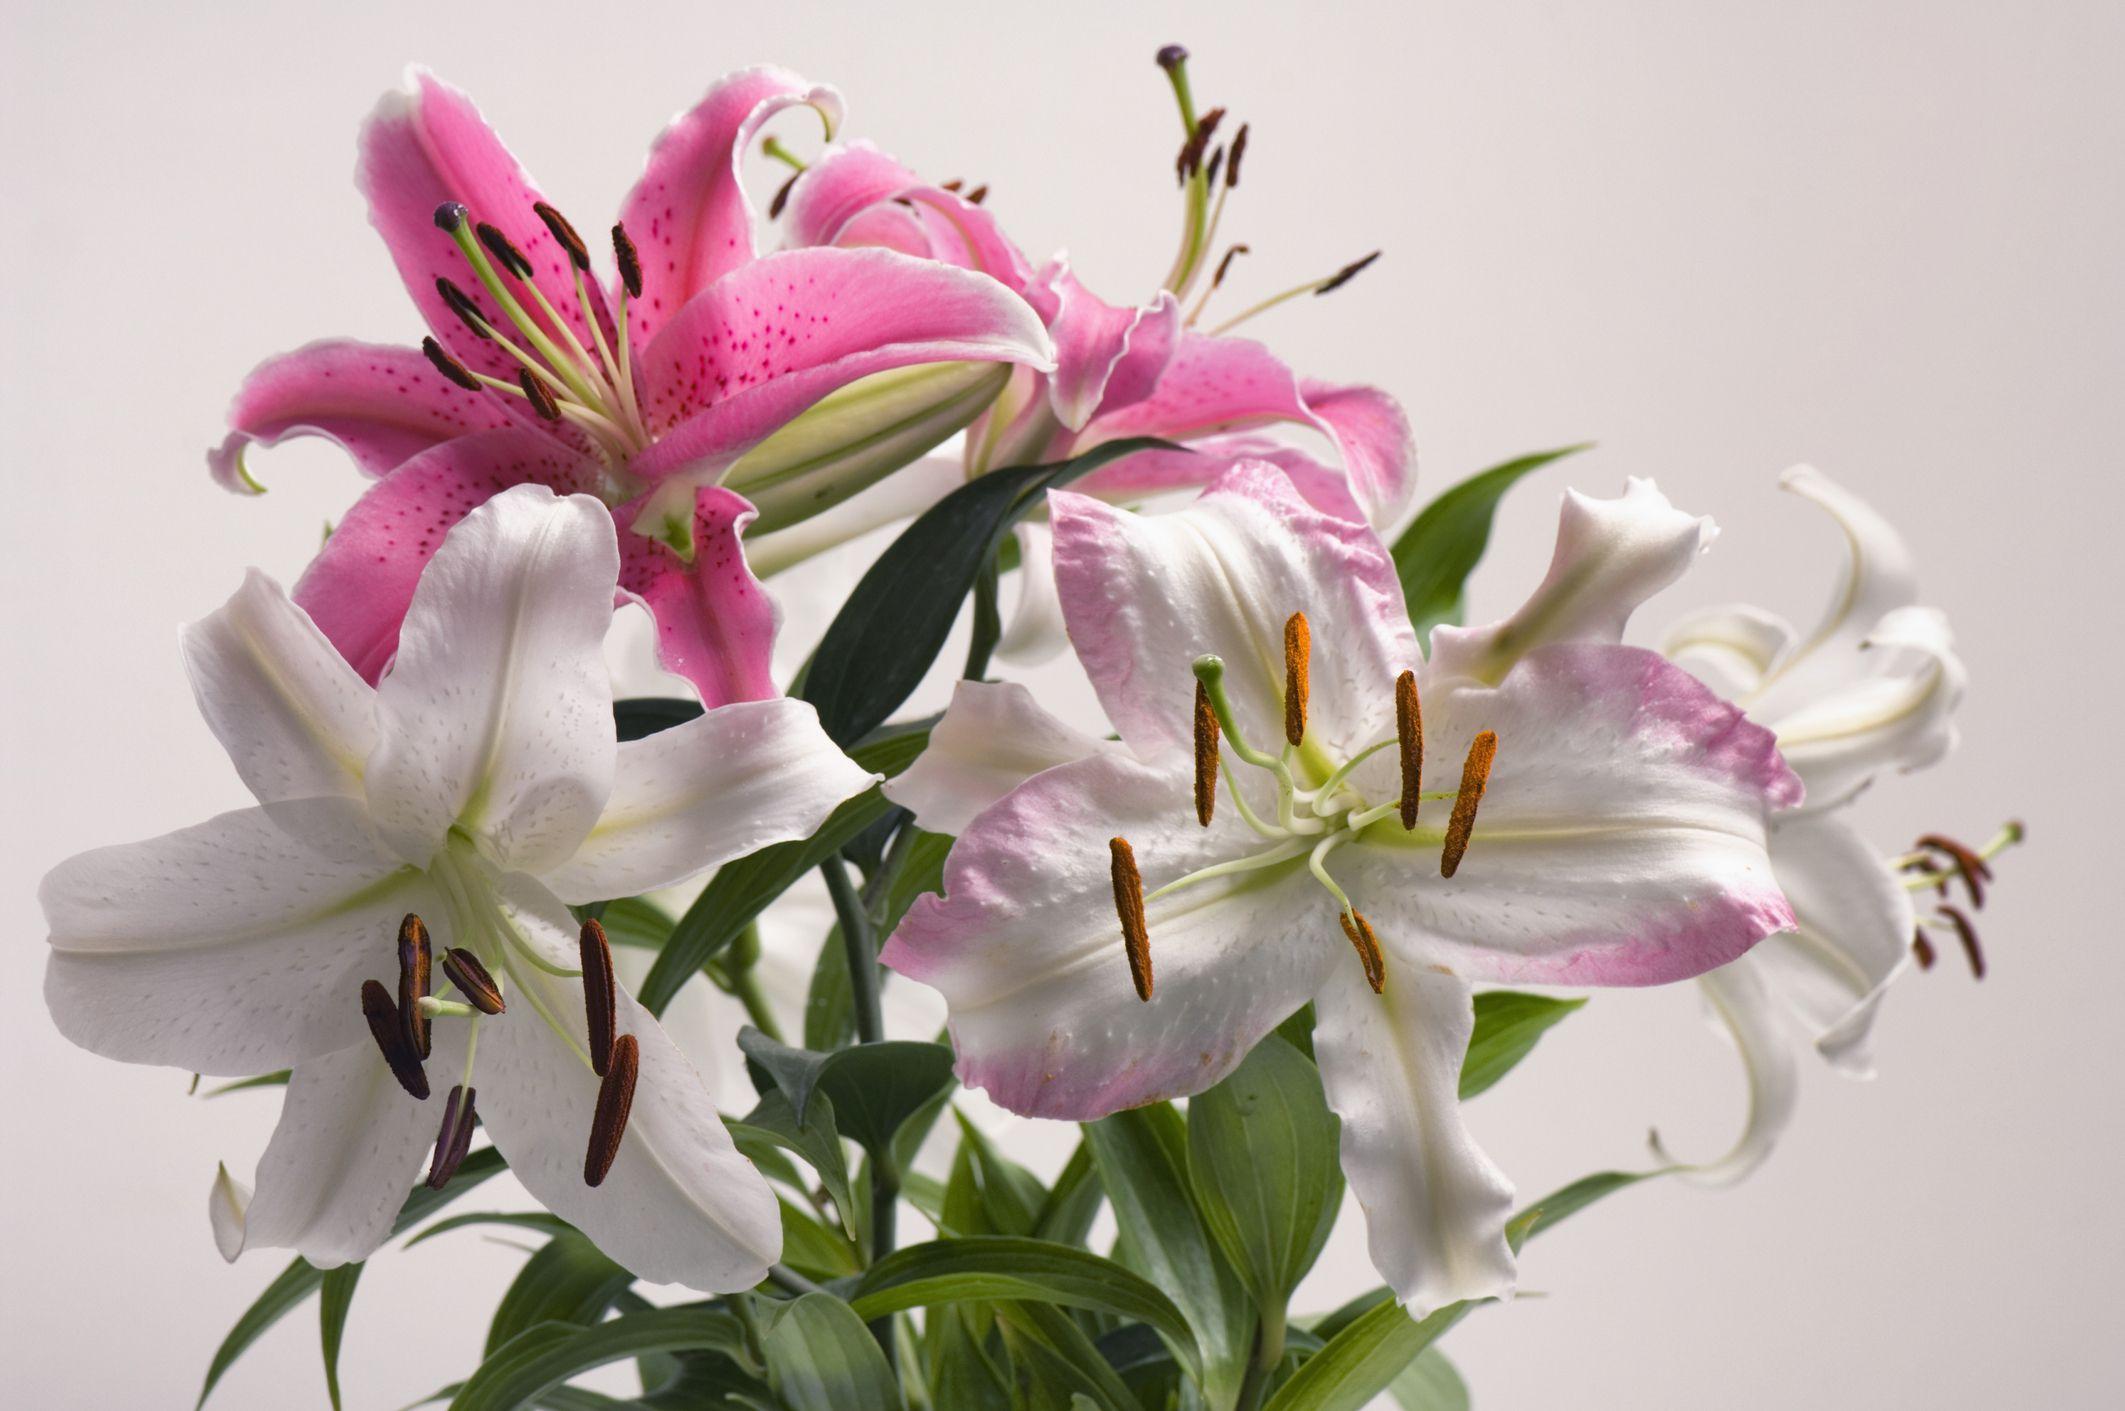 Cách trồng hoa bách hợp